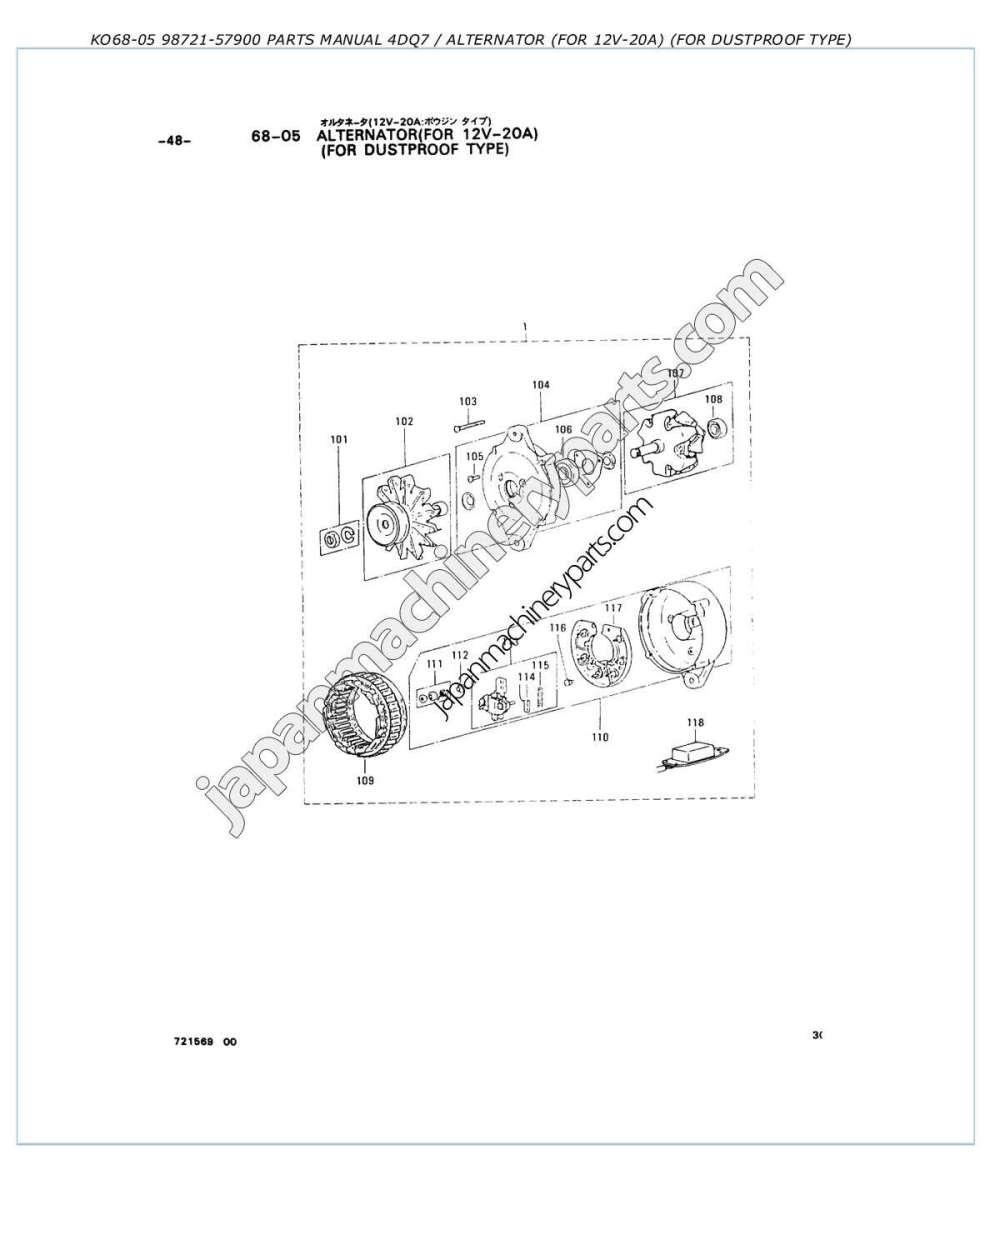 medium resolution of  alternator for dustproof type